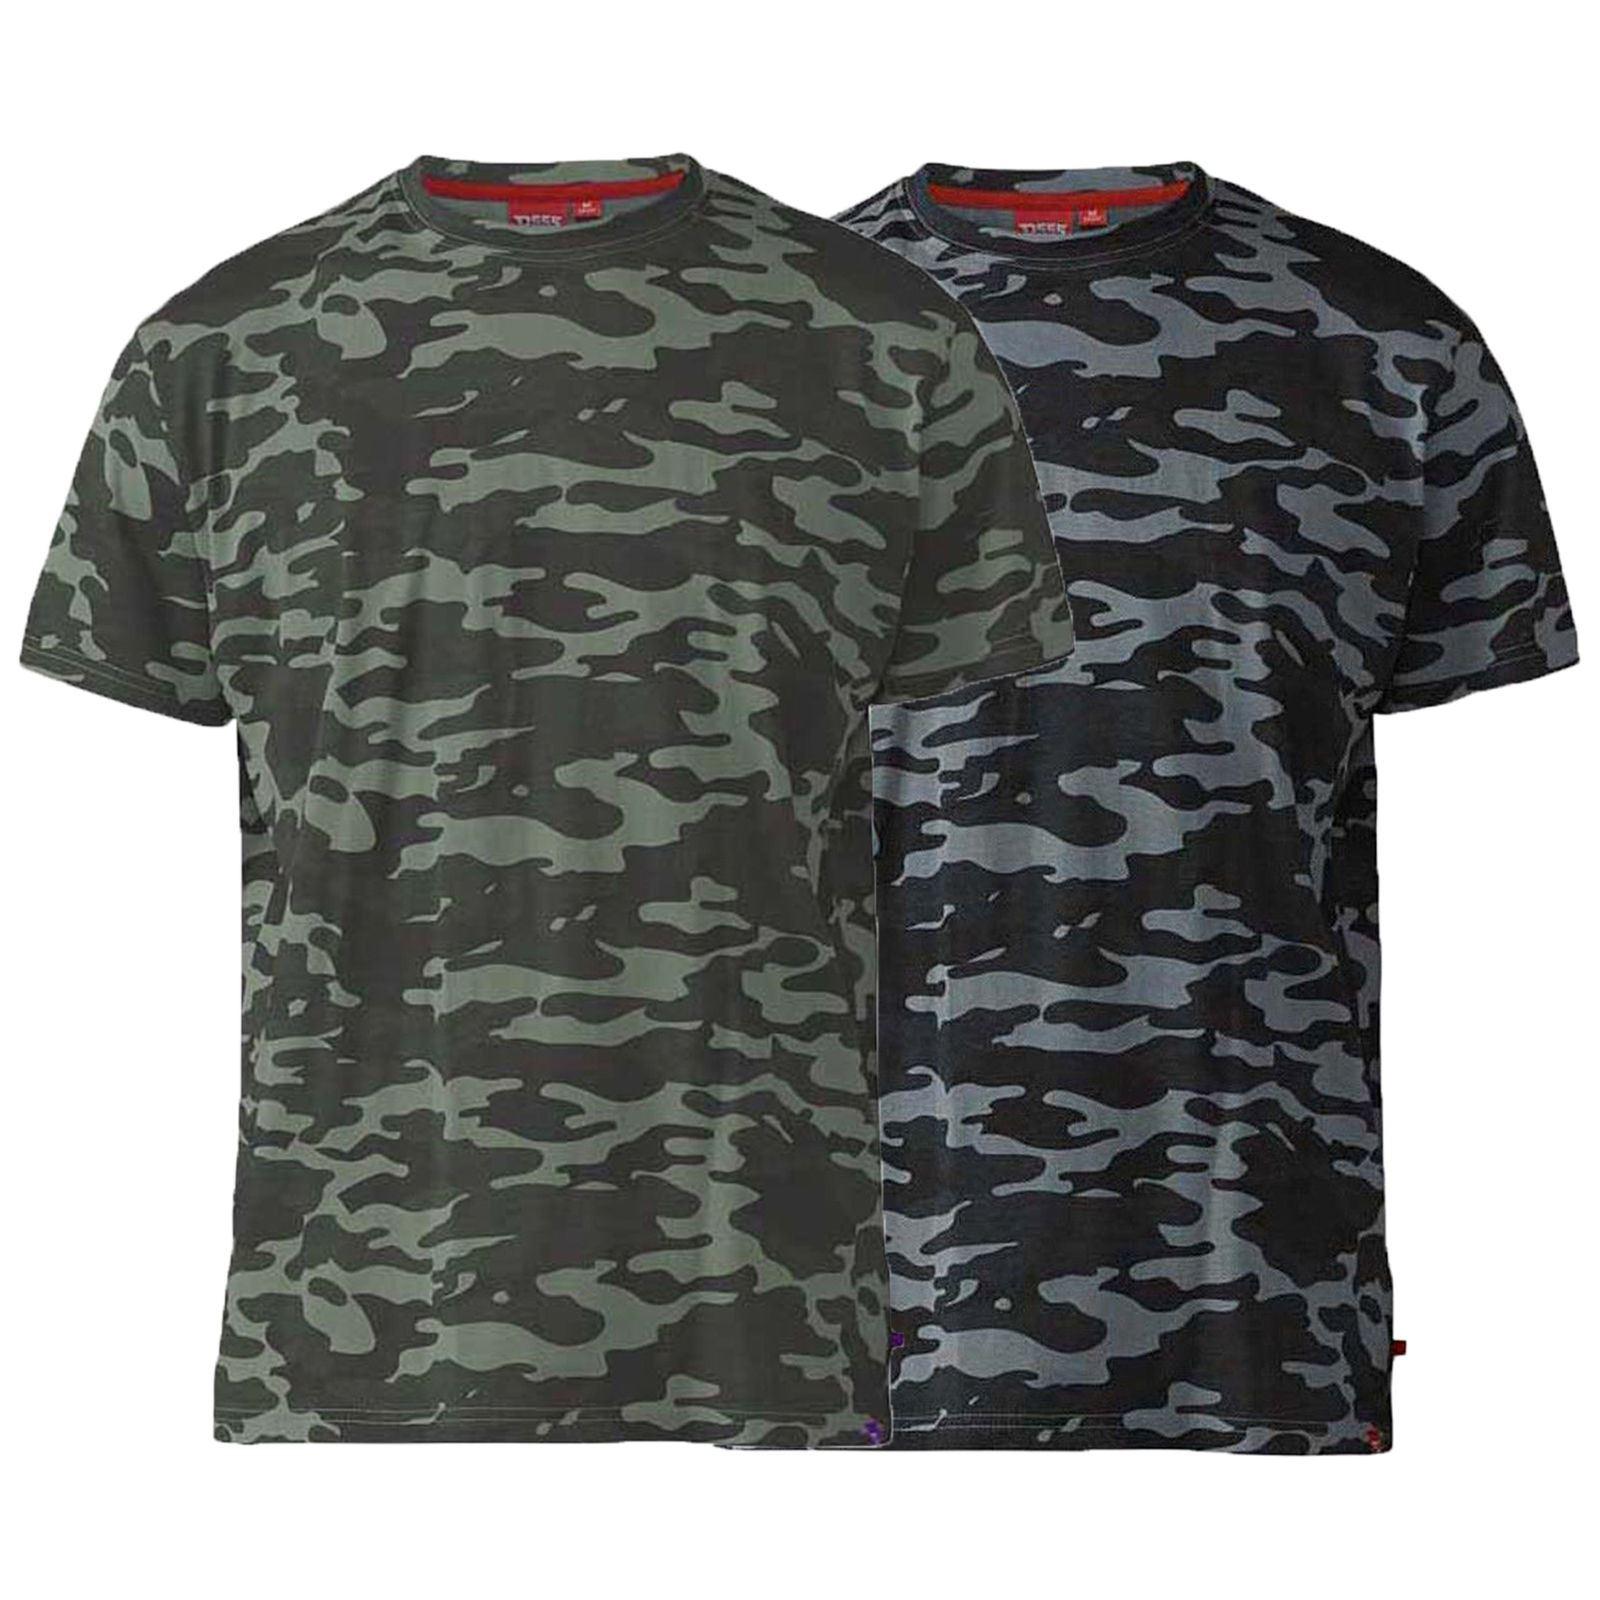 Mens Duke Big Size Short Sleeve Summer Hawaiian Graphic Print T-Shirt 3XL 4XL